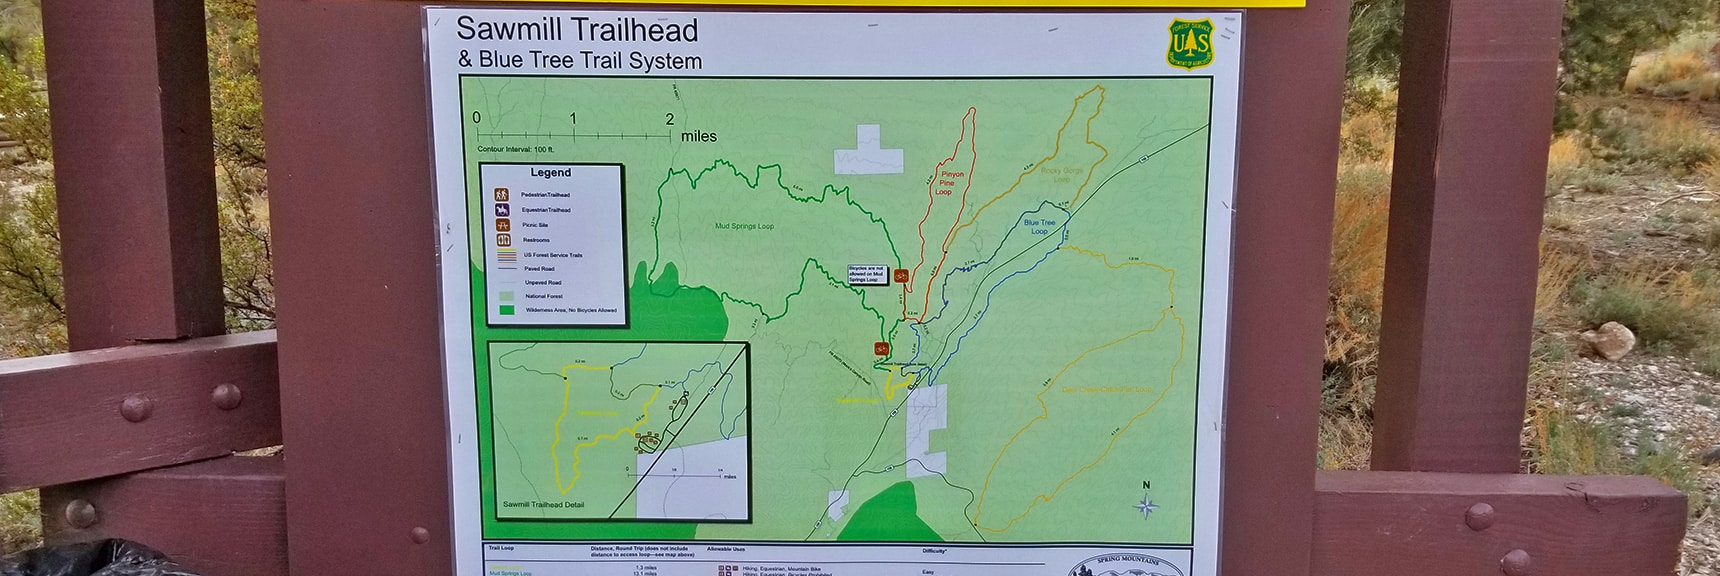 Sawmill Trailhead Trail System Display Map: Mud Springs, Pinyon Pine, Blue Tree, Rocky Gorge & Deer Creek Loops  Sawmill Trail to McFarland Peak   Spring Mountains, Nevada